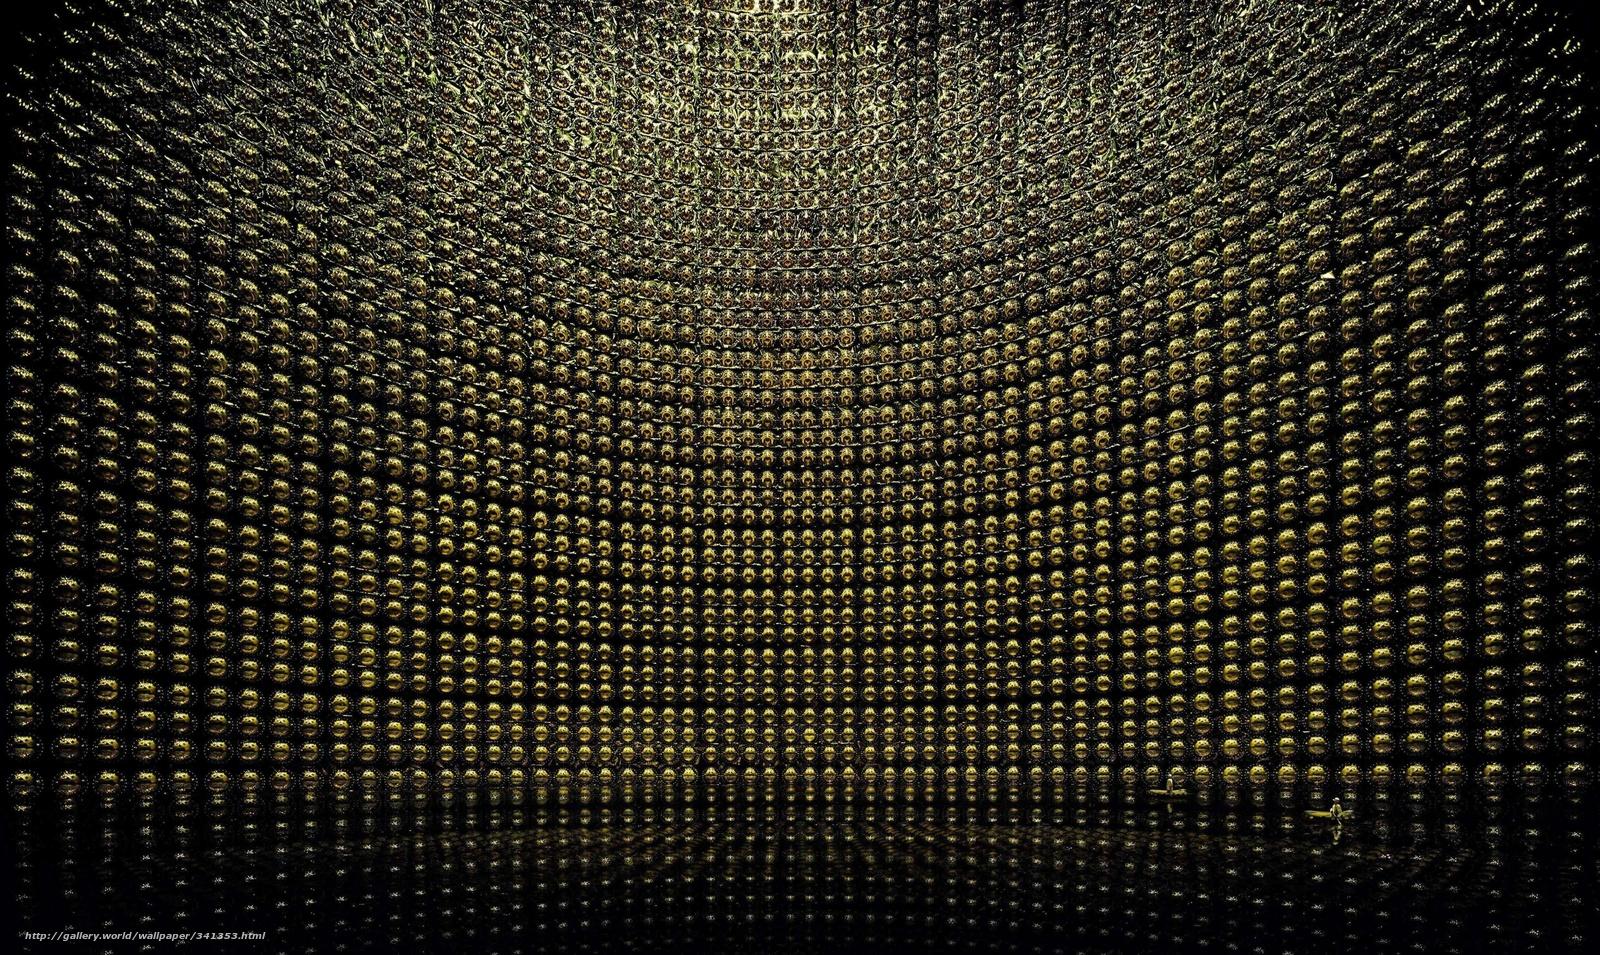 Download wallpaper neutrino detector water photomultipliers 1600x955